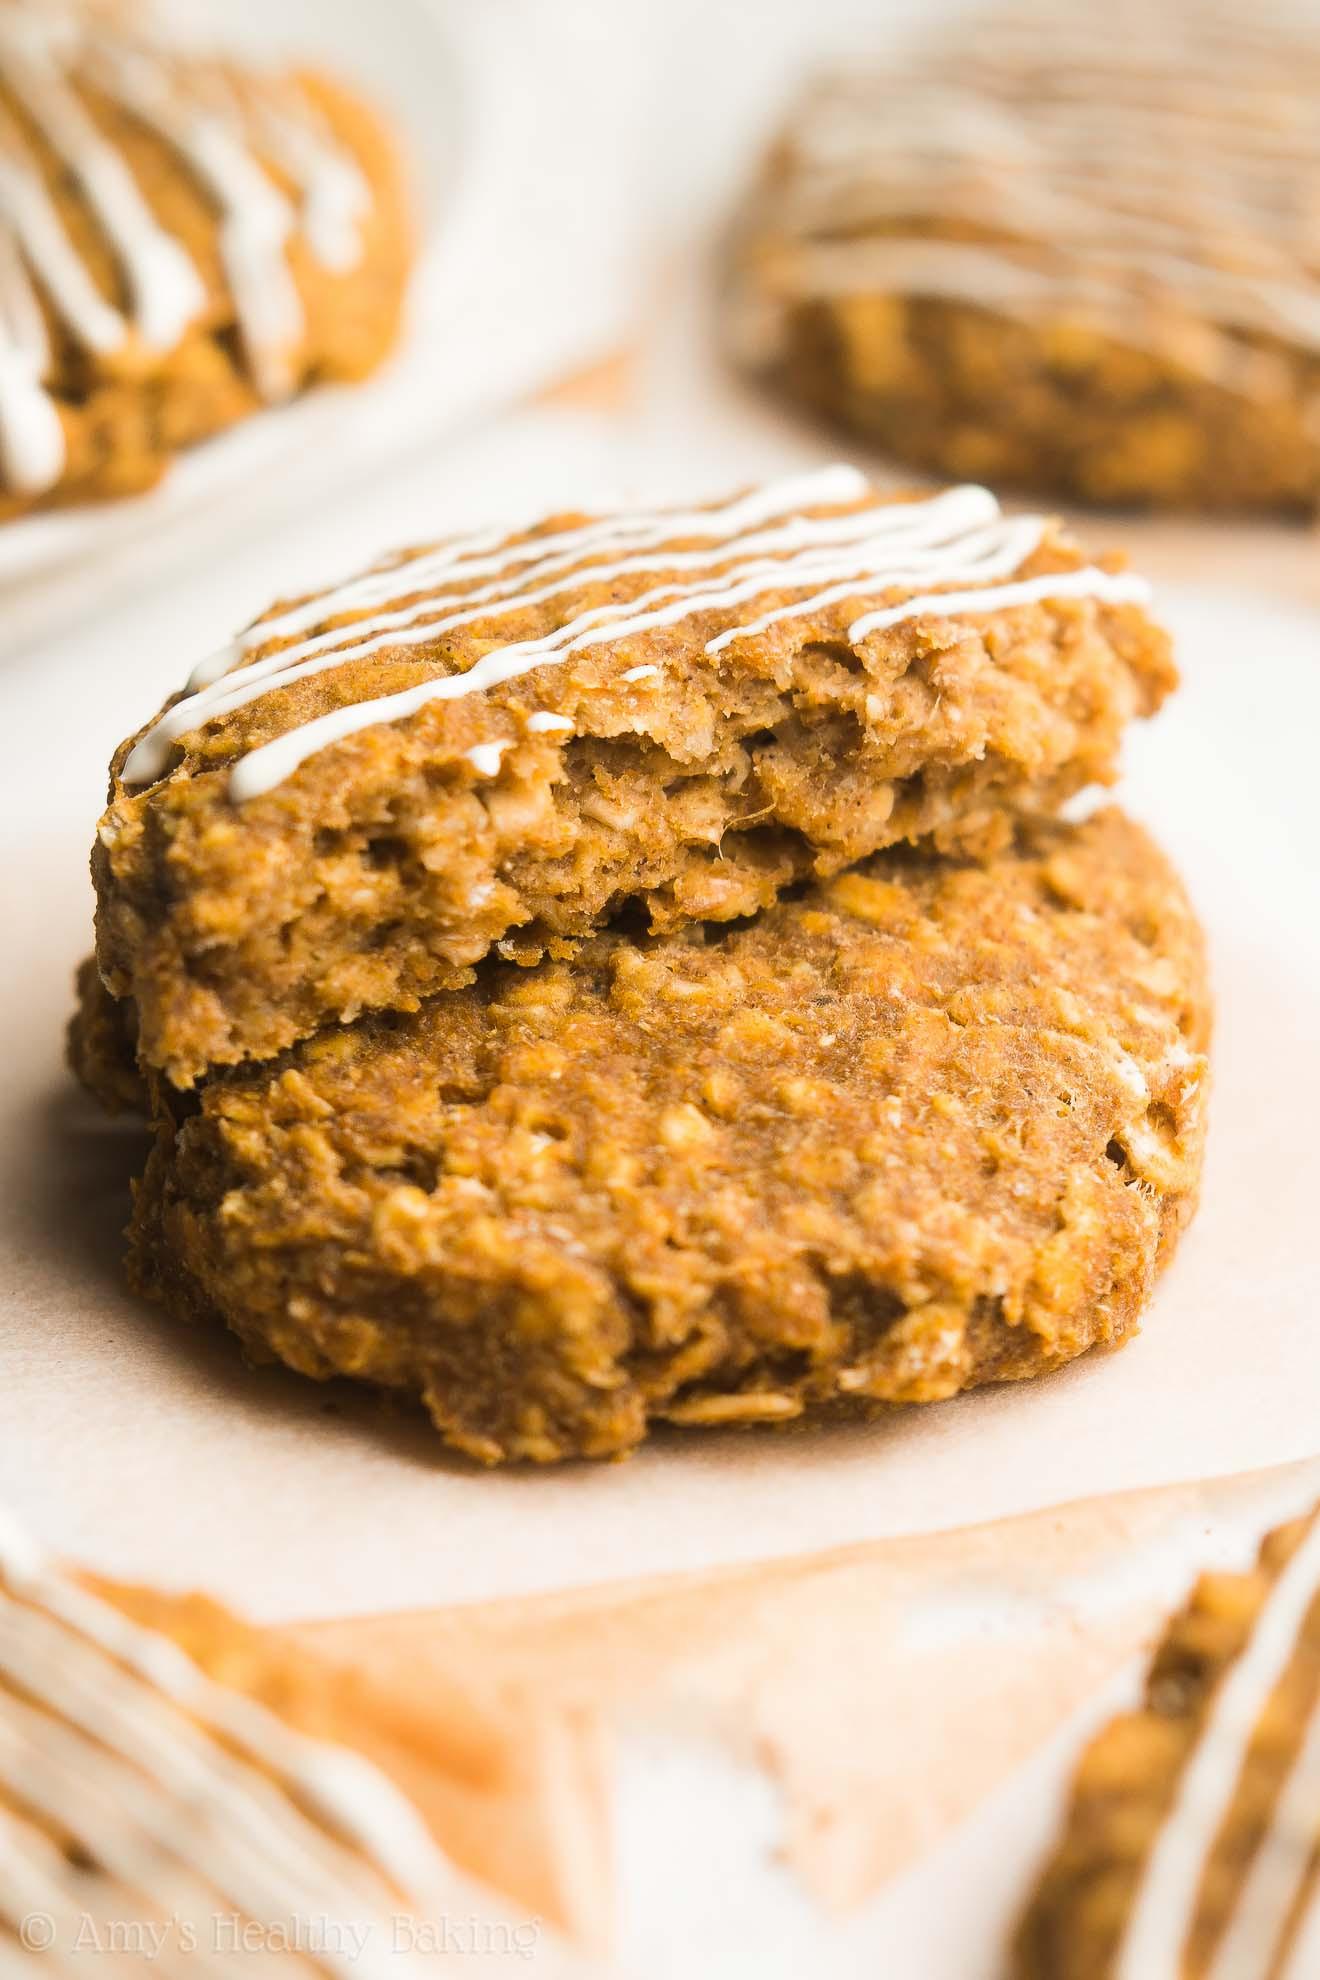 Pumpkin Cookie Recipes Healthy  healthy pumpkin cookies recipes